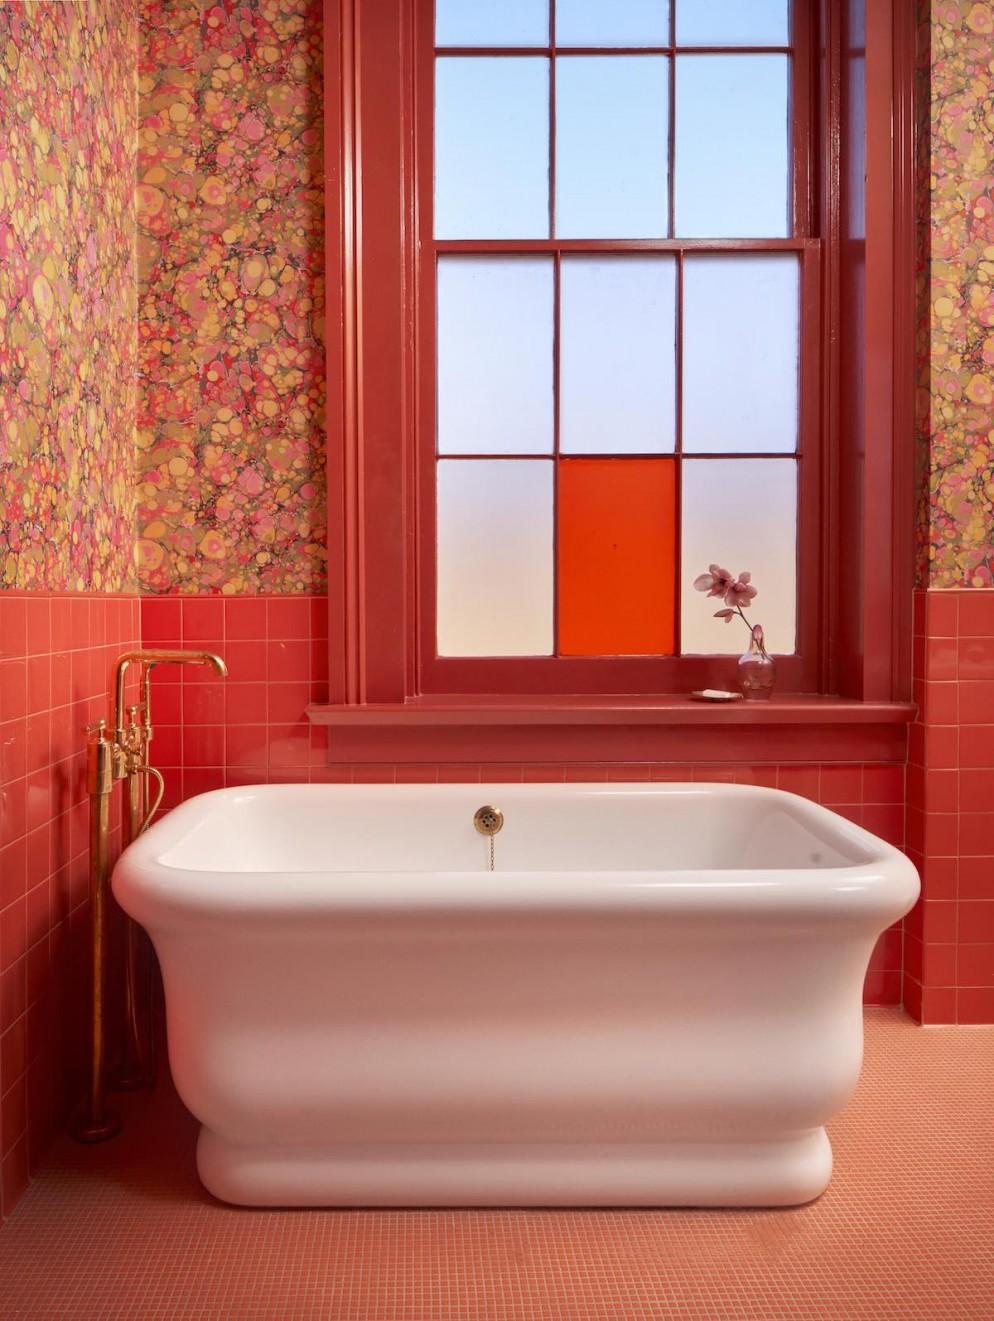 17 .Hotel-Saint-Vincent-Room-x-Bathroom-01-by-Nick-Simonite